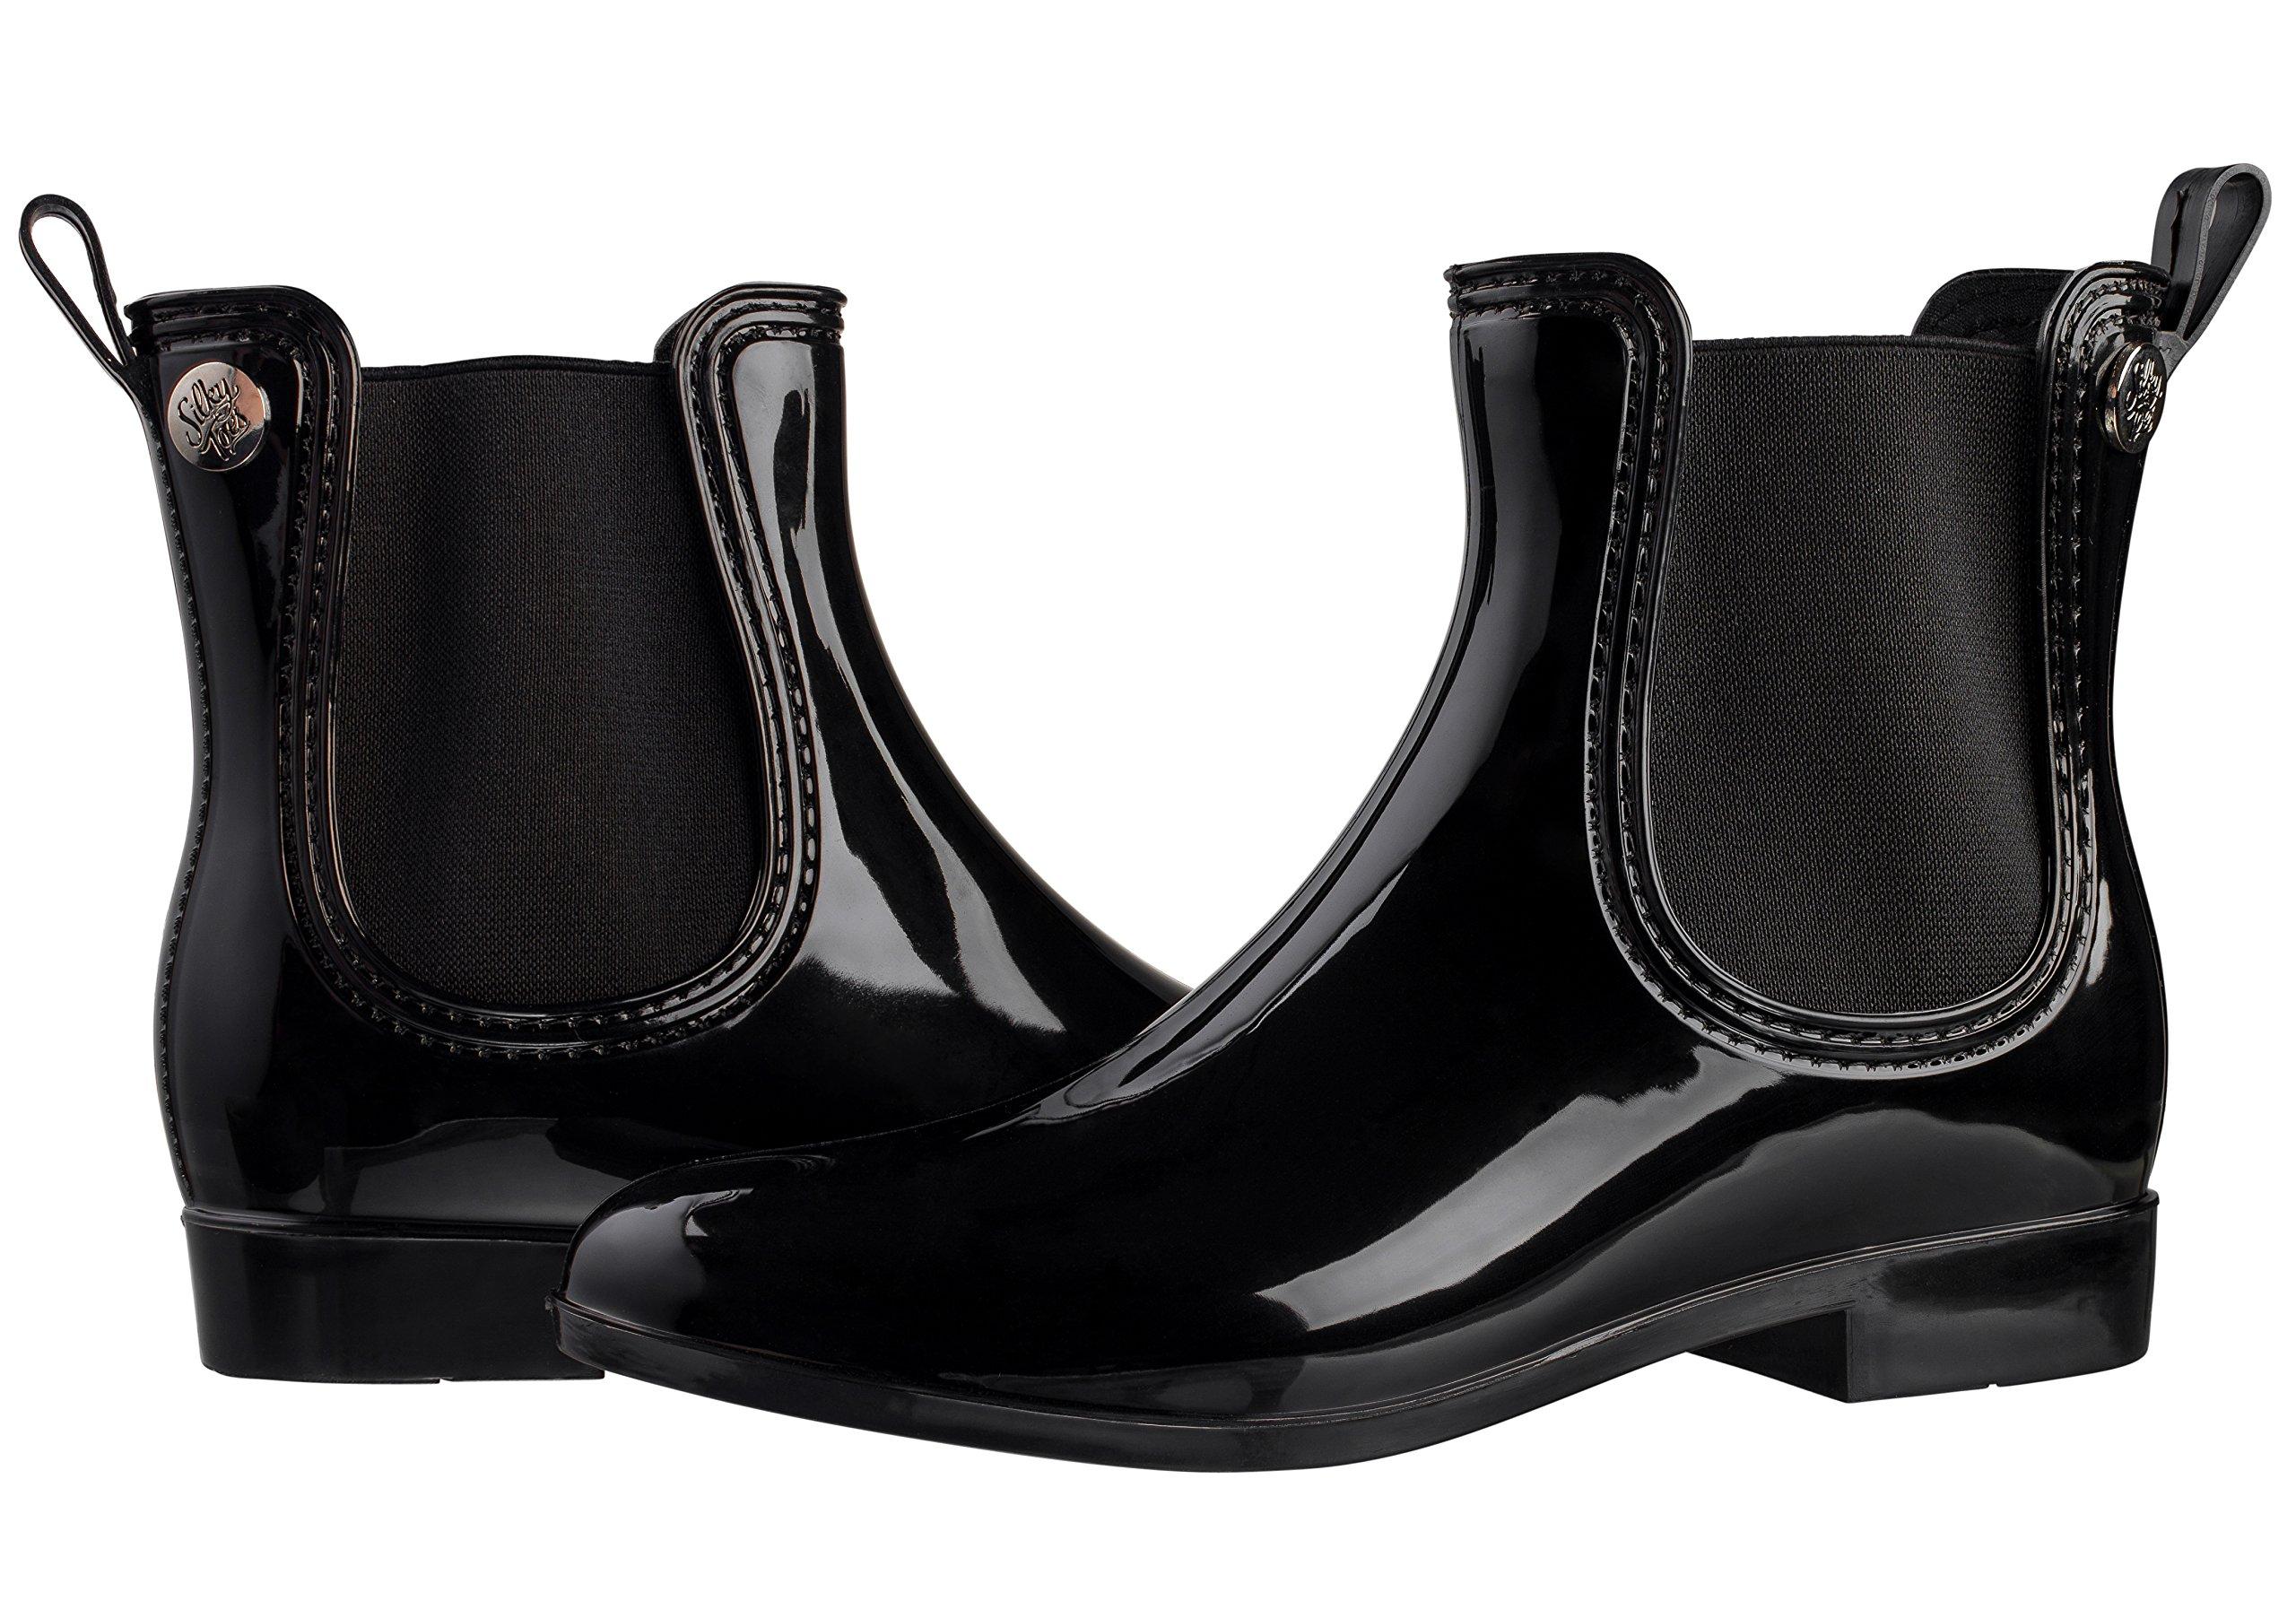 Silky Toes Women's Fashion Elastic Slip On Short Rain Boots (41, Black)